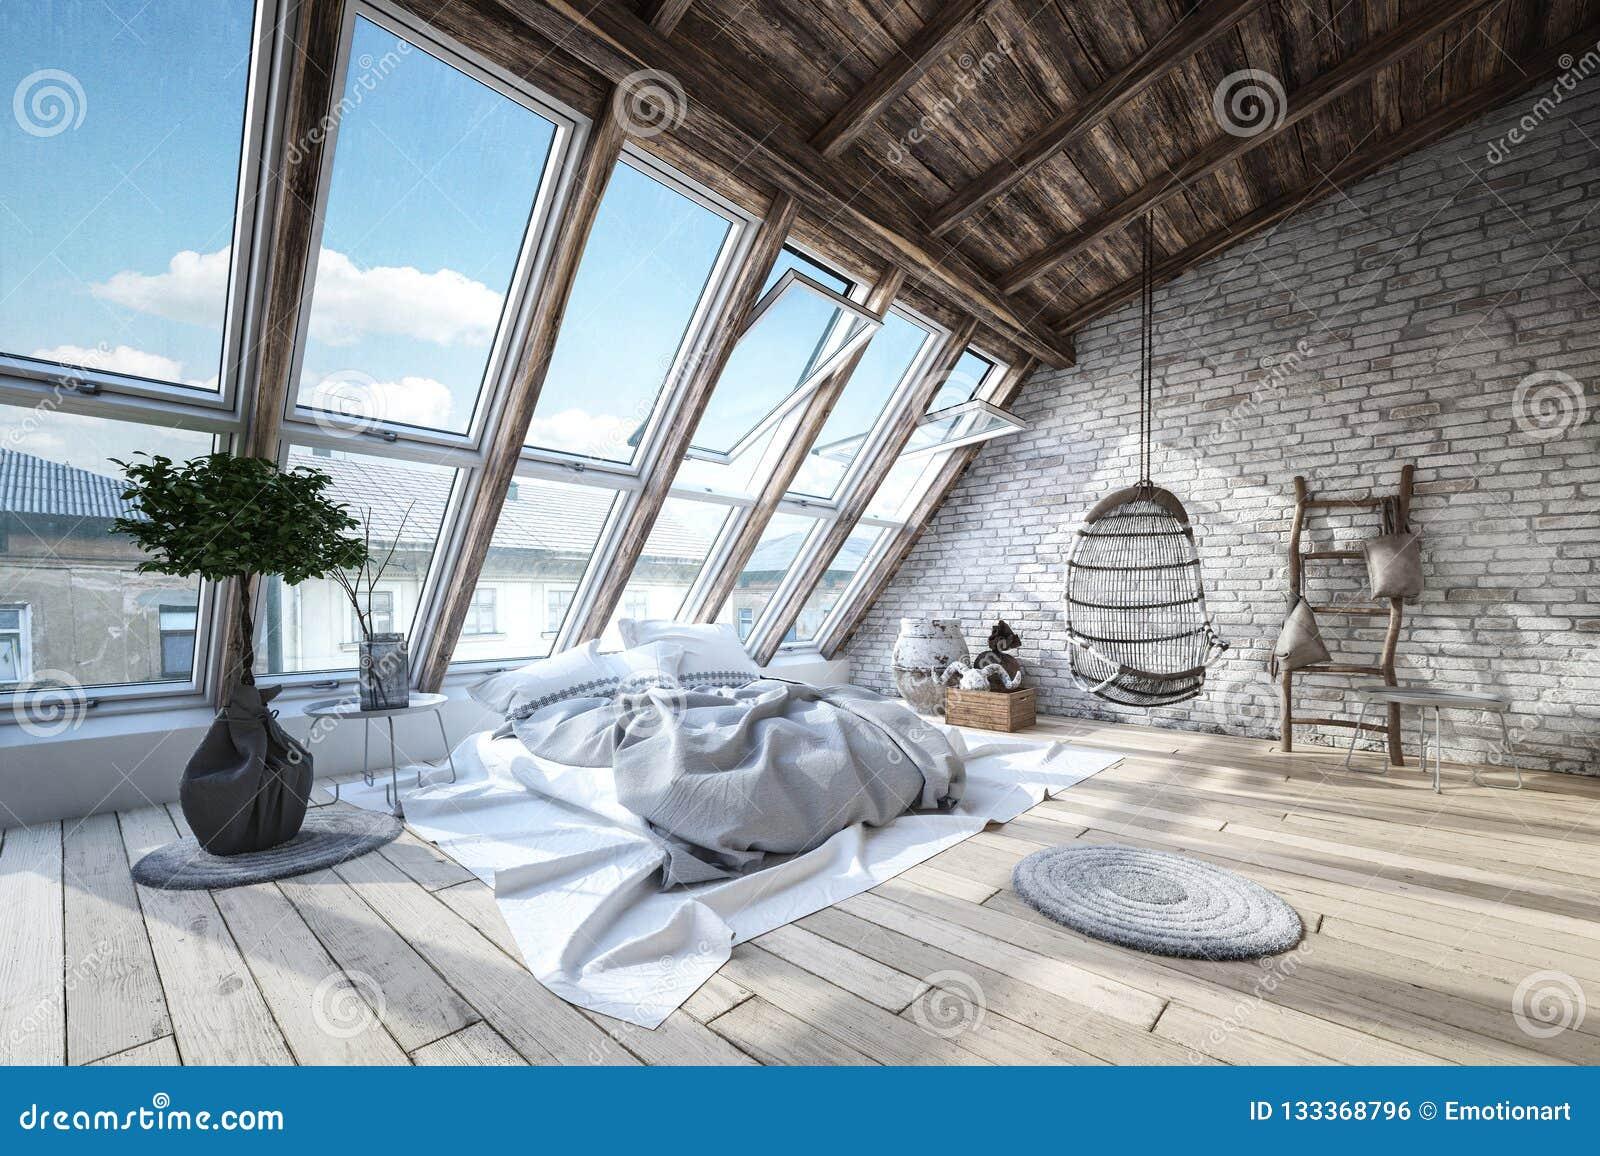 Modern, luxury, industrial loft bedroom interior